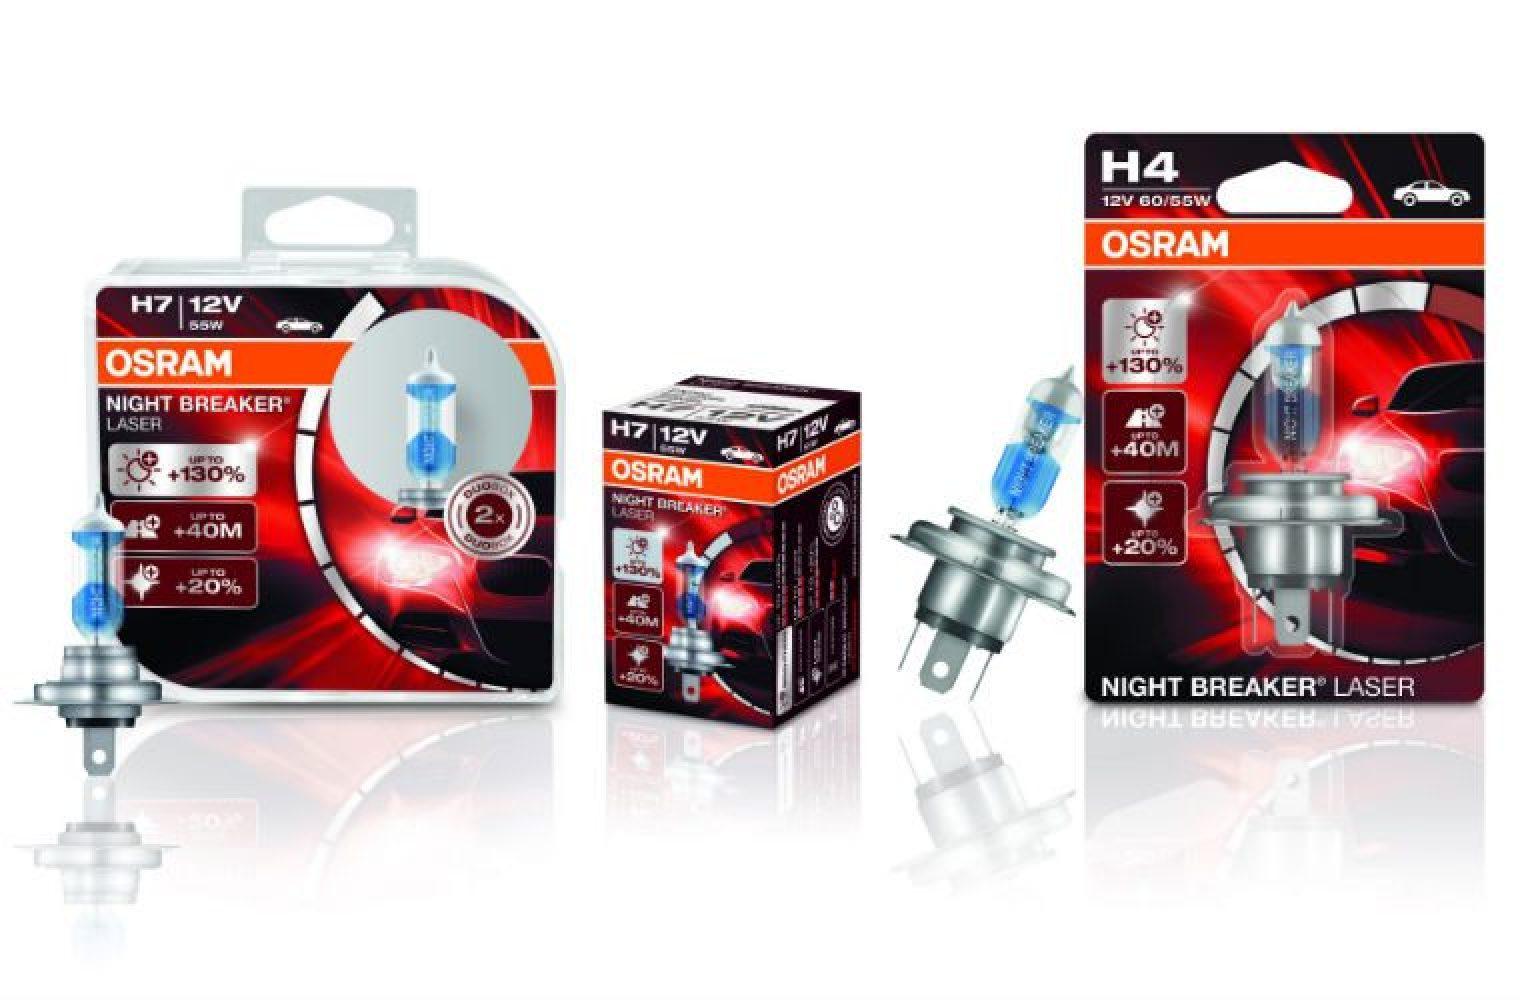 Review OSRAM's Night Breaker Laser range - Garagewire